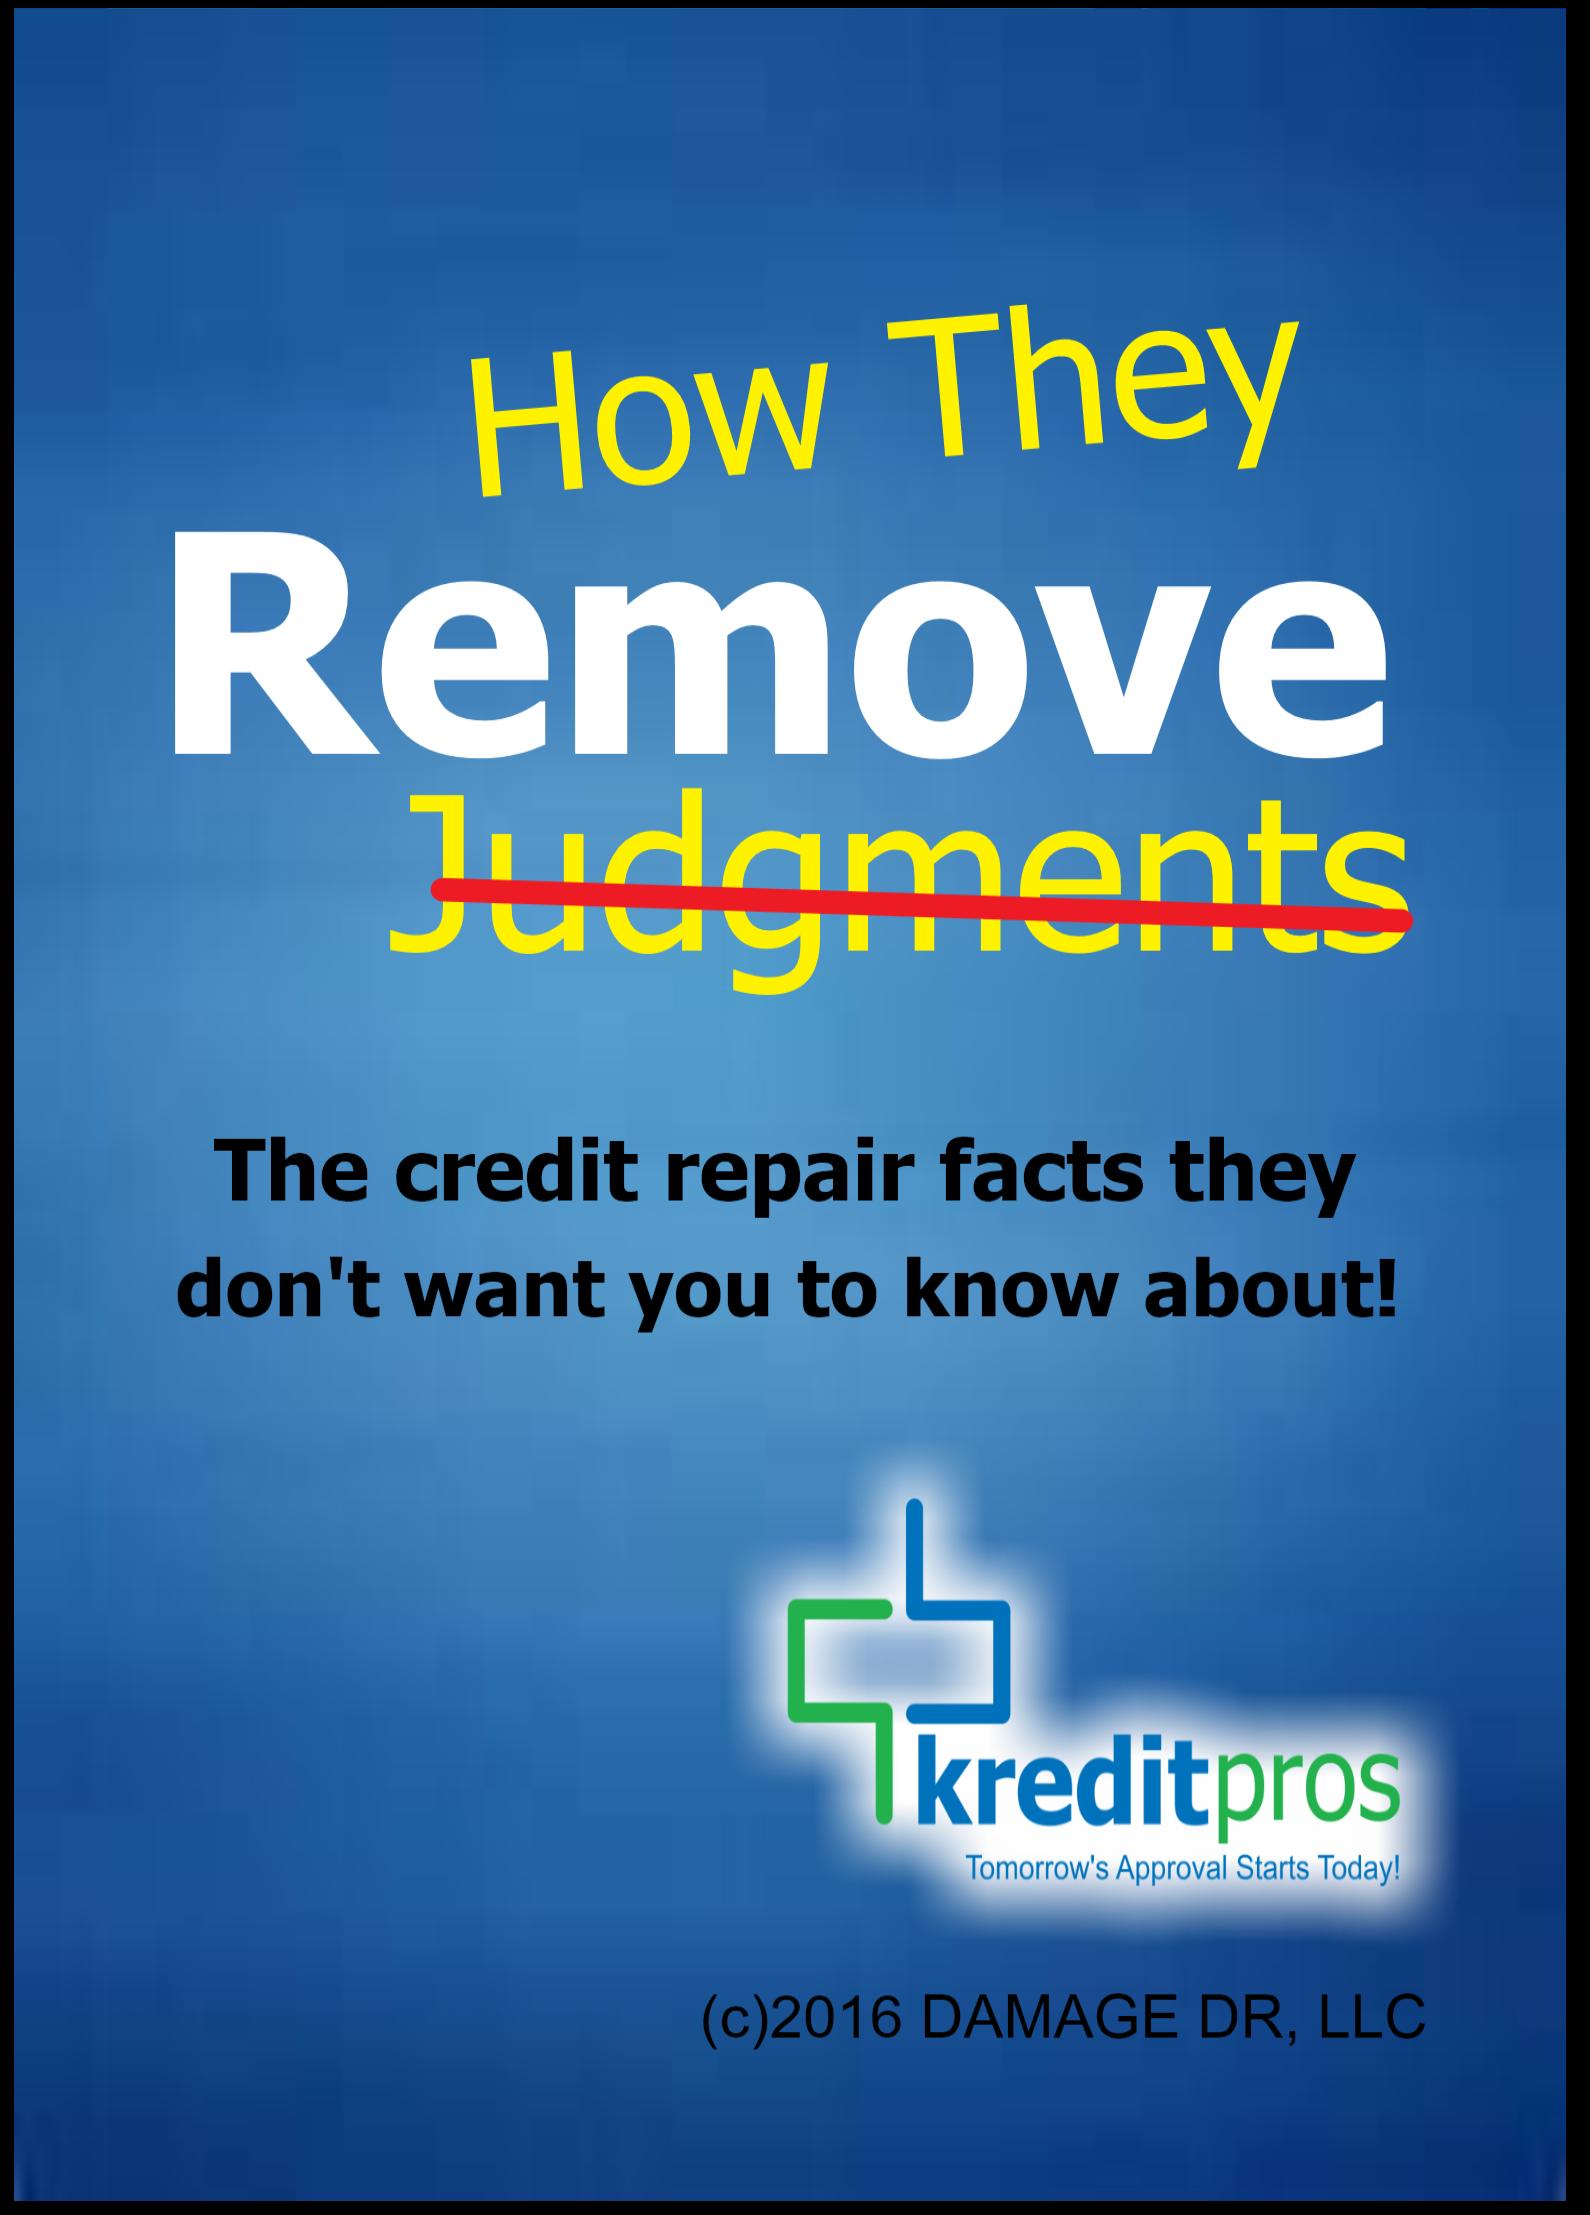 2b132869a821621c9499a71c60149ea4 - How To Get Rid Of A Judgement On Your Credit